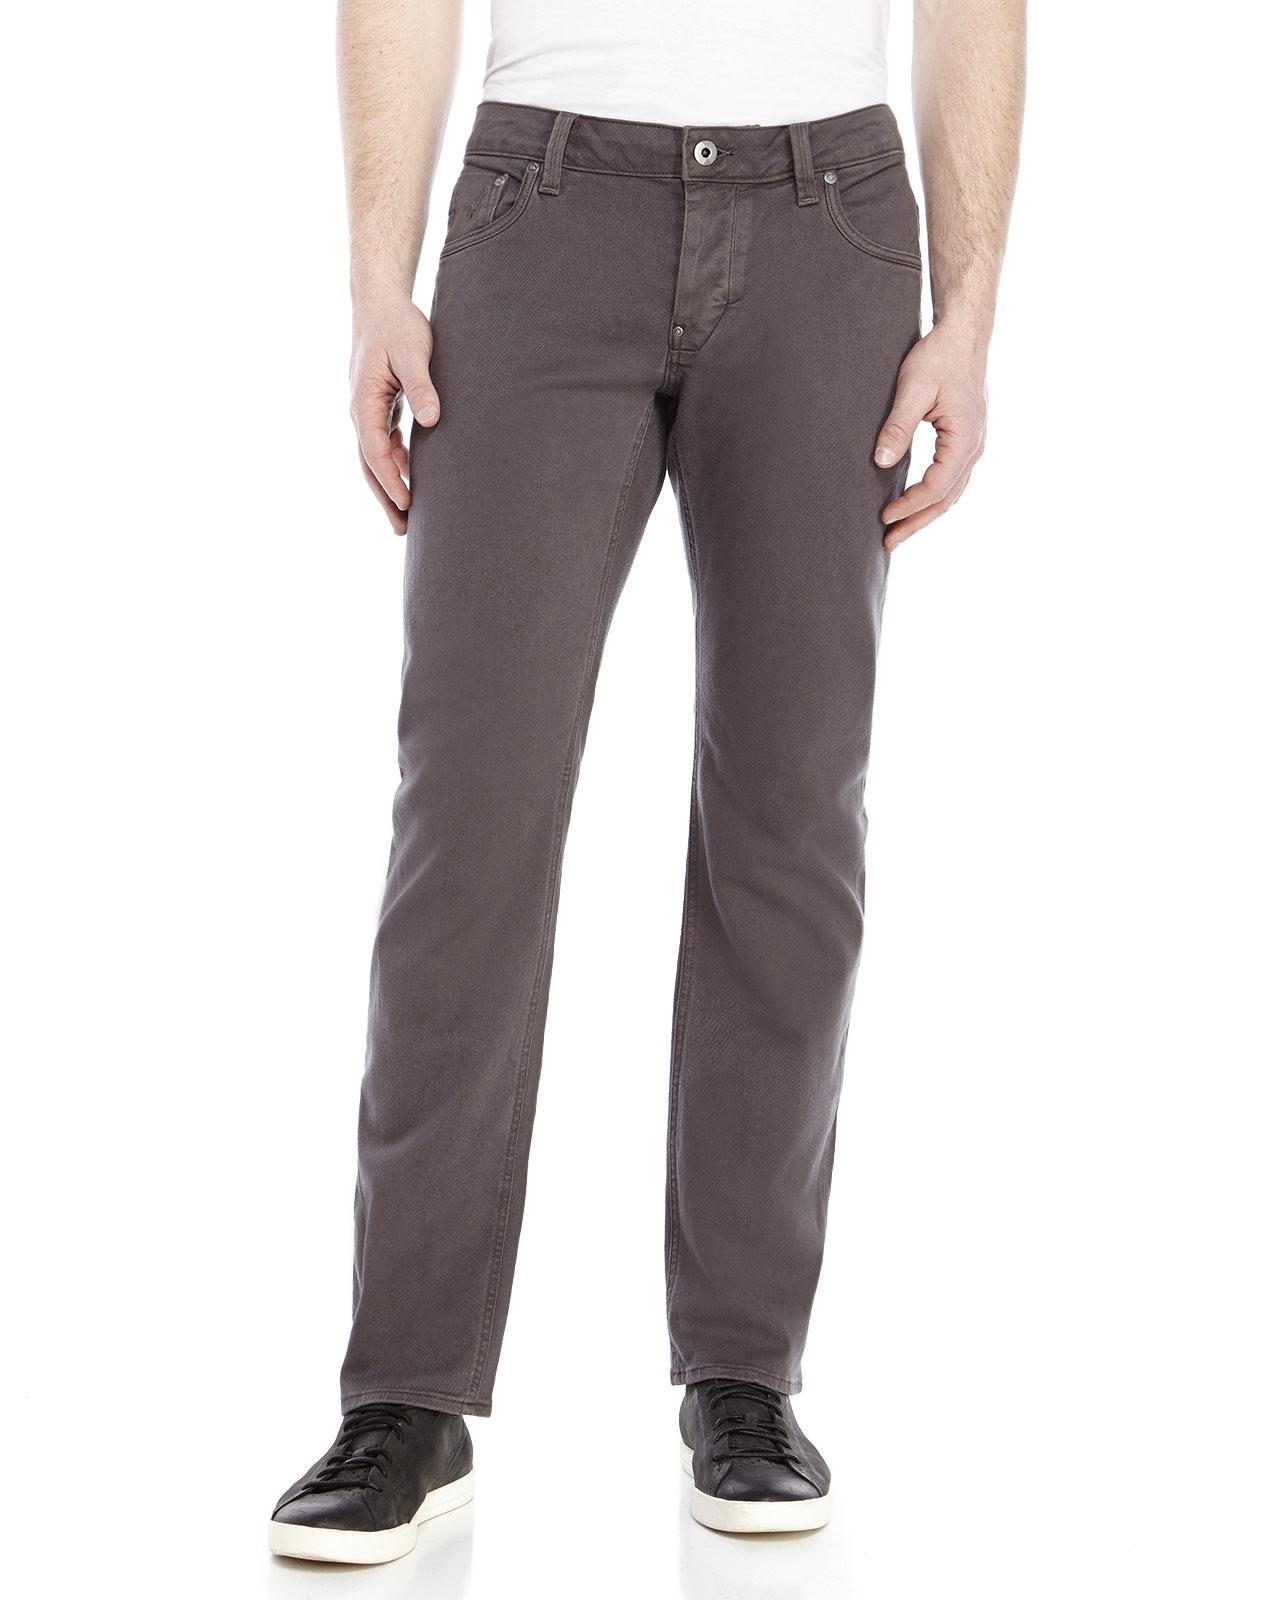 g star raw attac slim straight leg jeans in gray for men. Black Bedroom Furniture Sets. Home Design Ideas